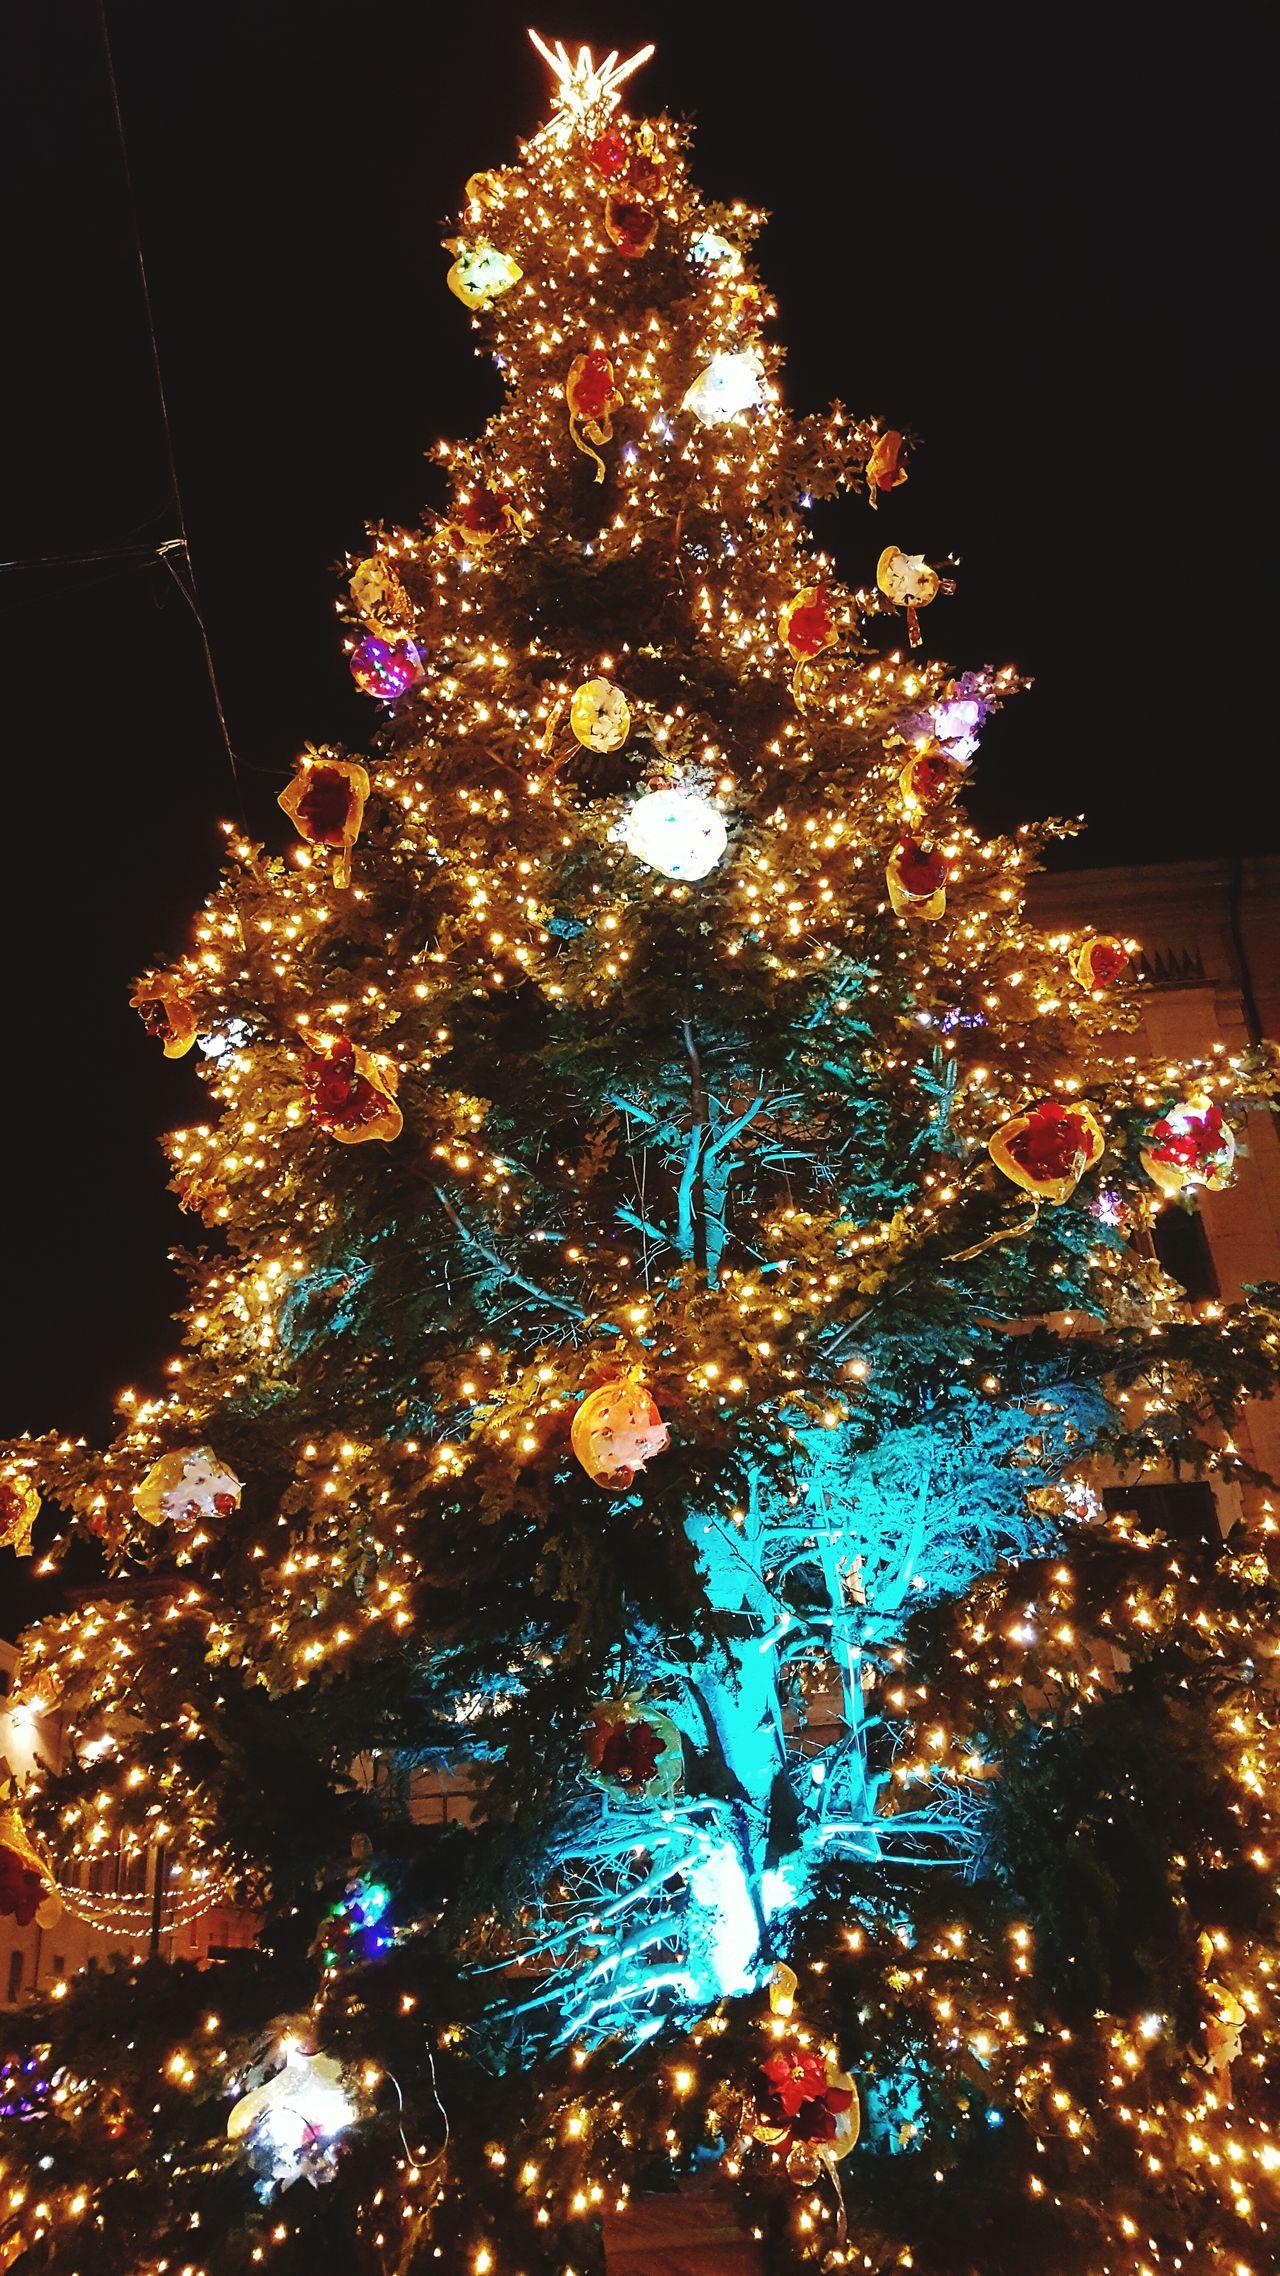 Christmas Tree Christmas Celebration Christmas Decoration Christmas Lights Night Tradition Tree Holiday - Event Illuminated